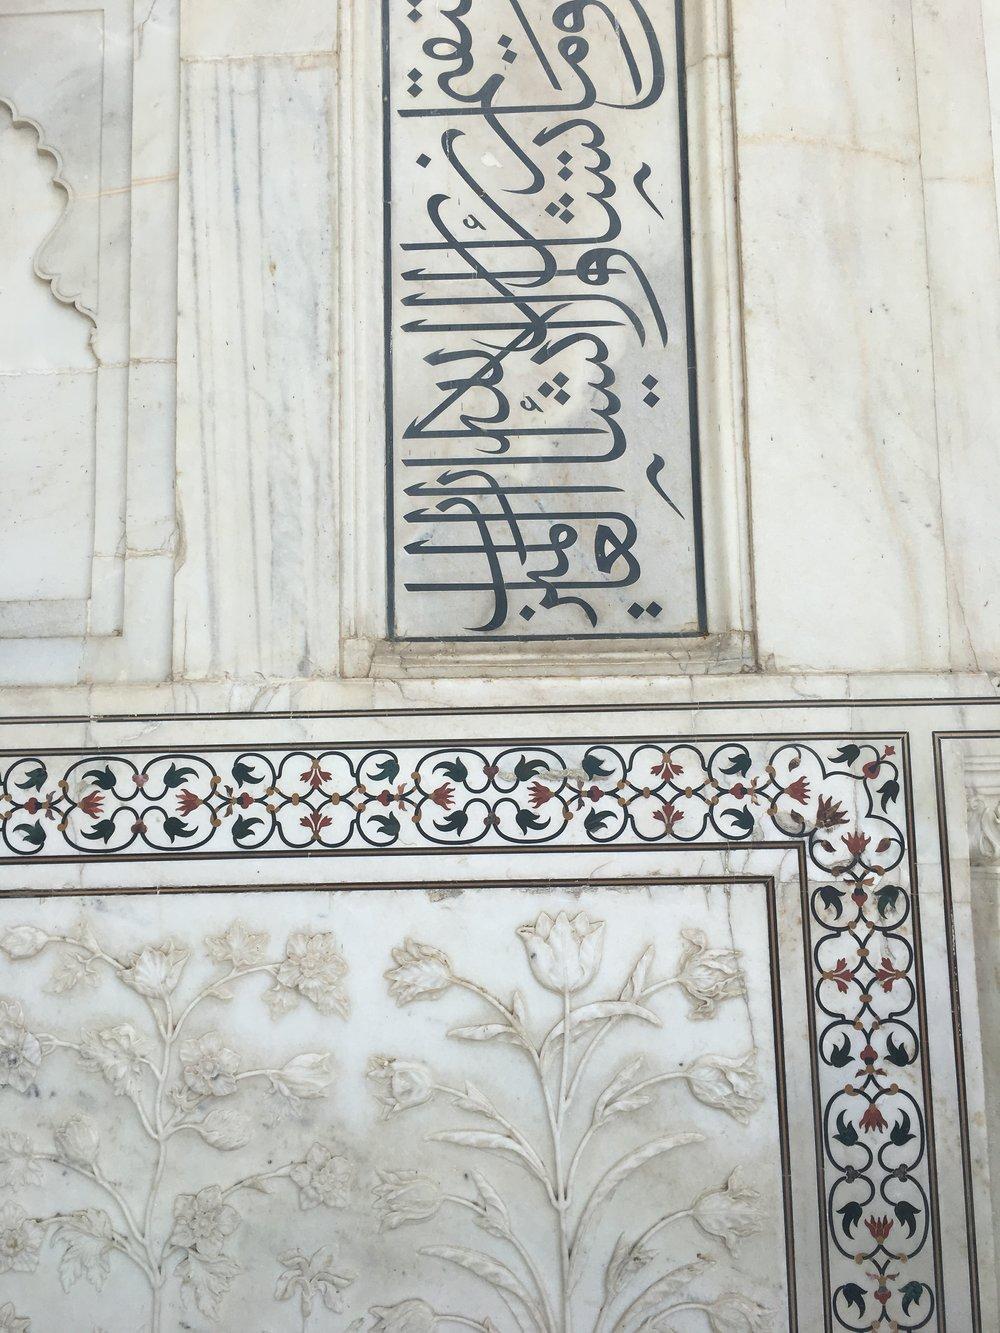 Details on the Taj Mahal exterior